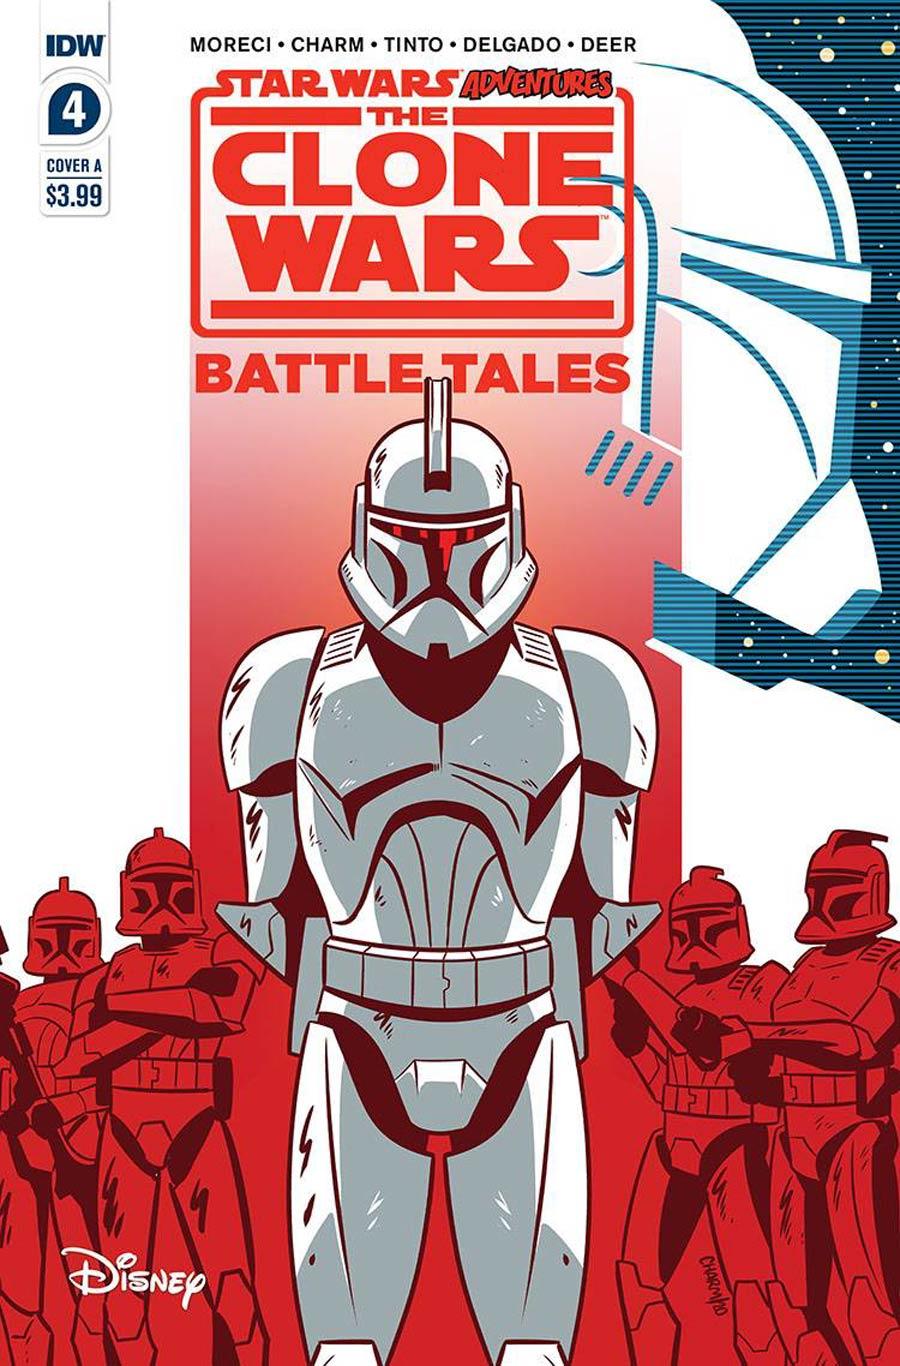 Star Wars Adventures Clone Wars Battle Tales #4 Cover A Regular Derek Charm Cover